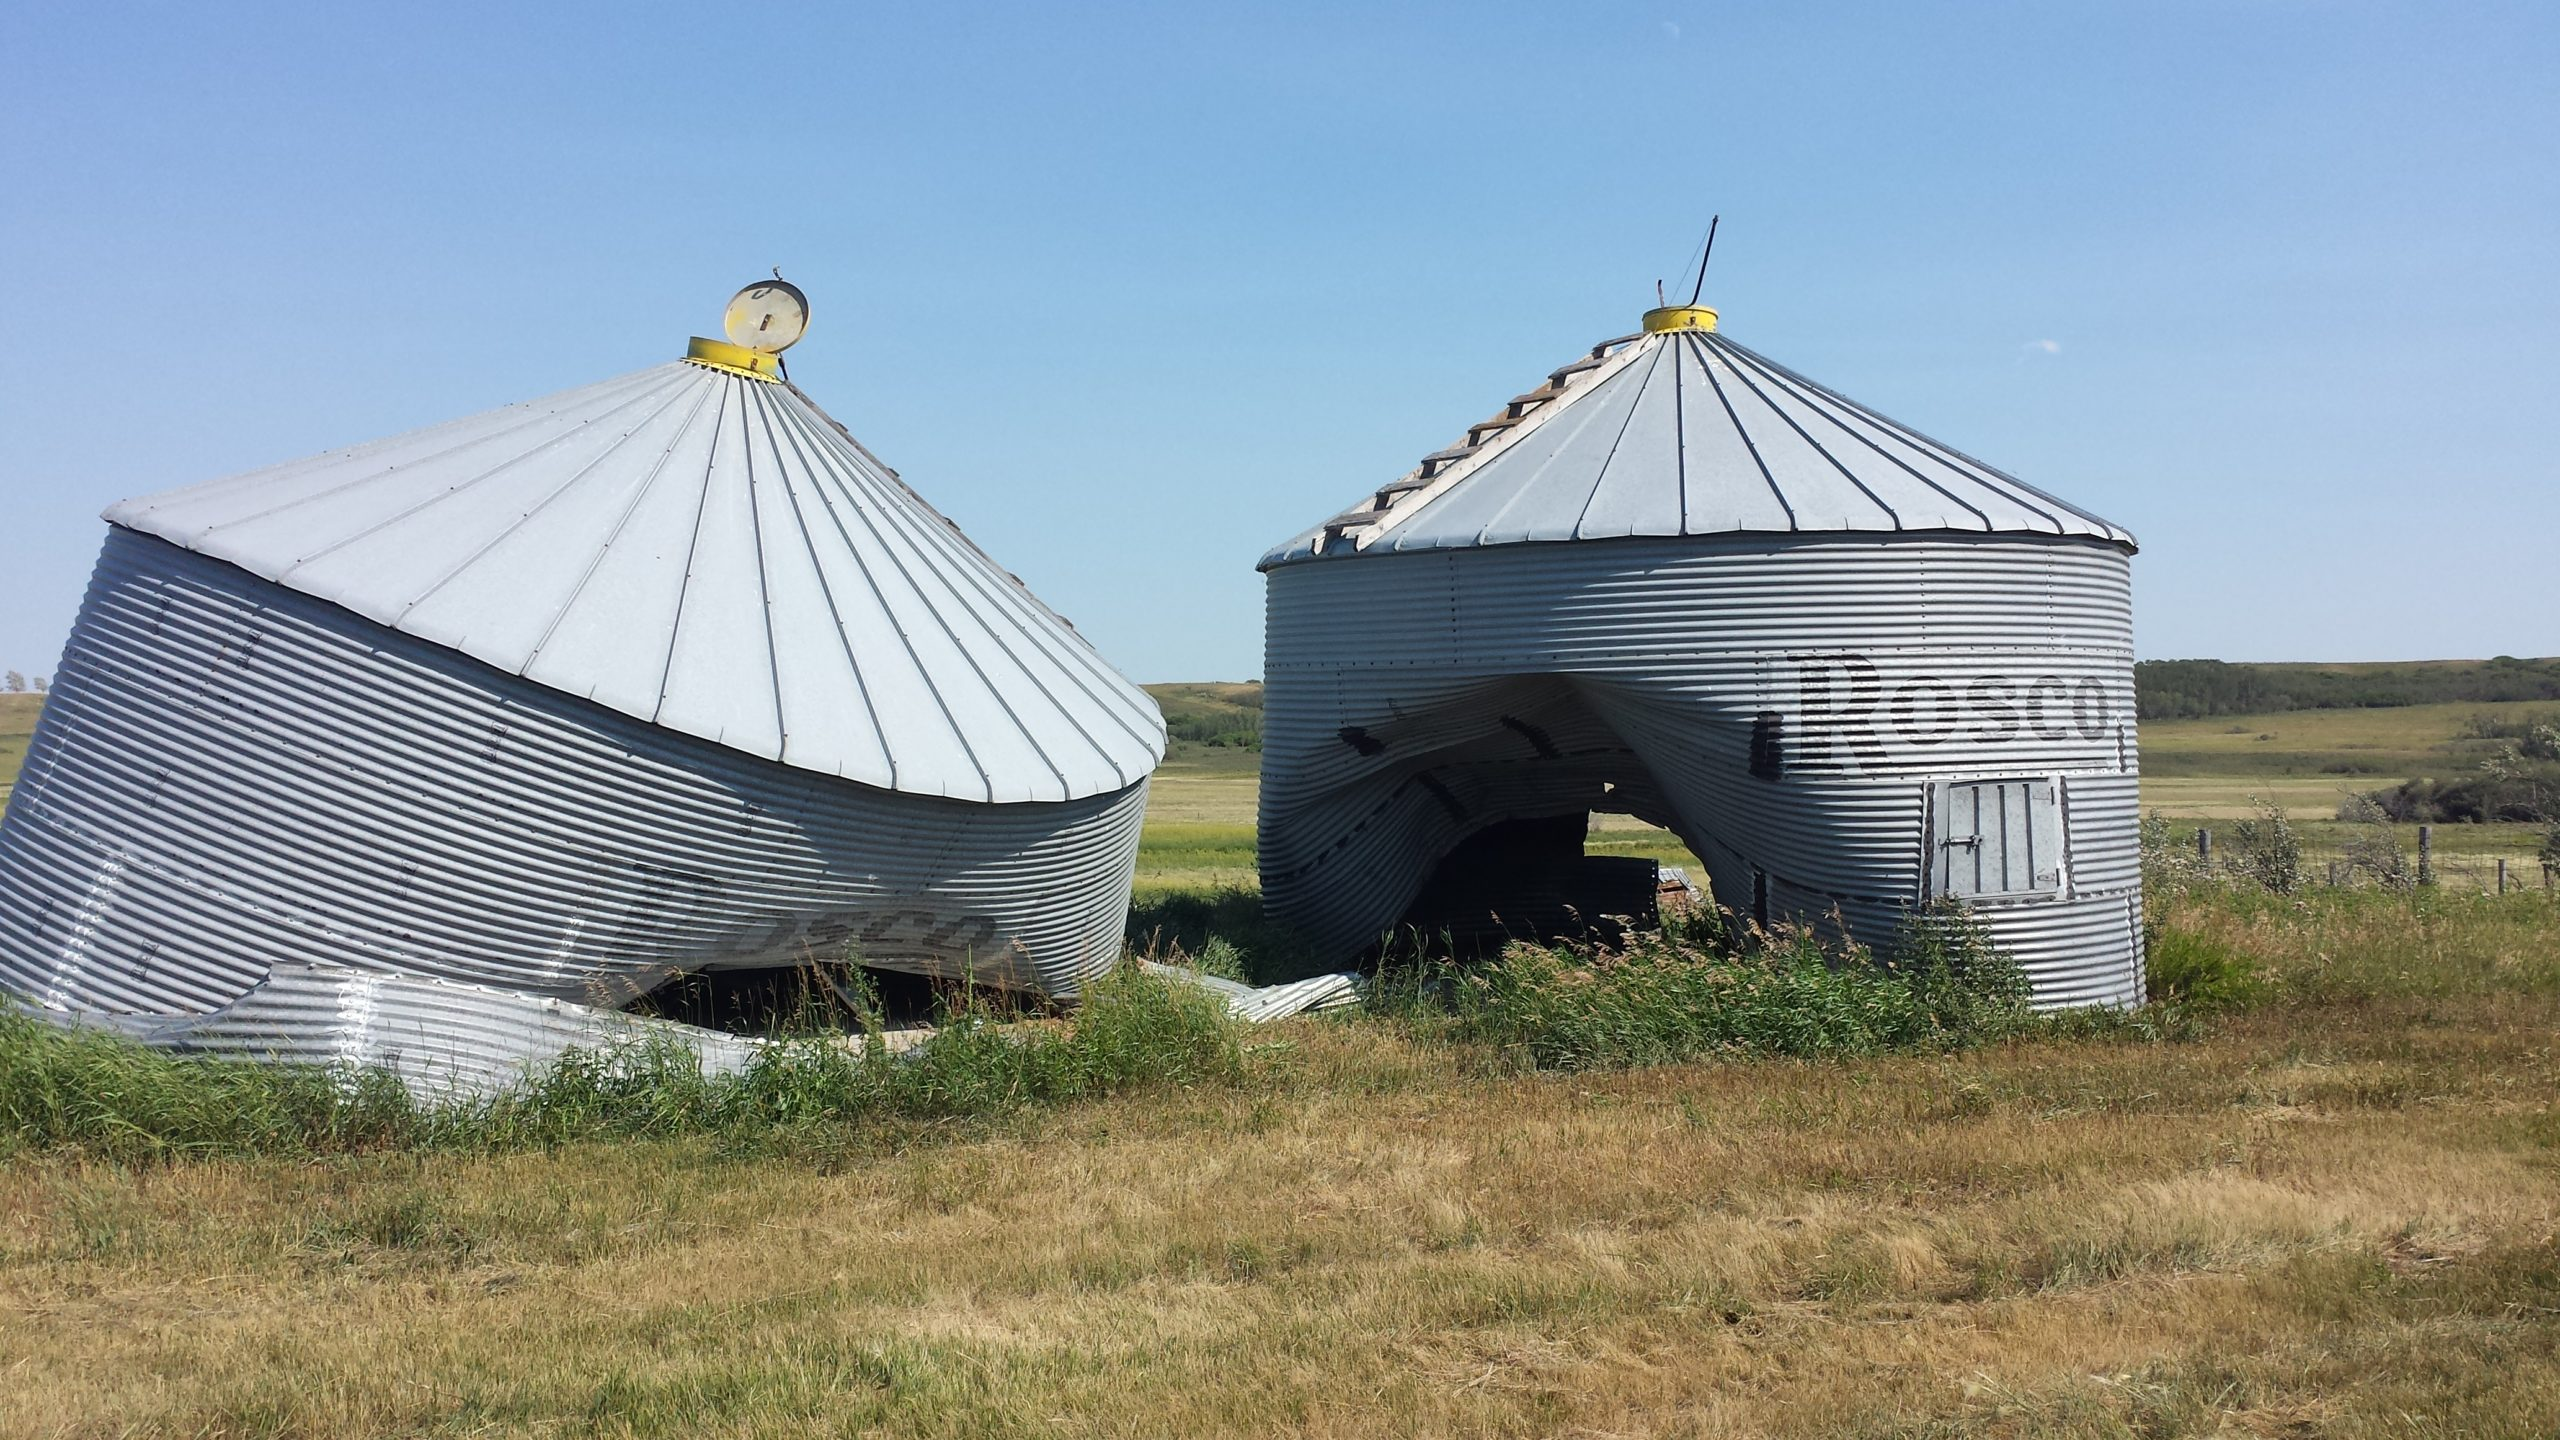 Grain Bin Home Saskatchewan Rcmp Search For Vandals Who Damaged Two Grain Bins